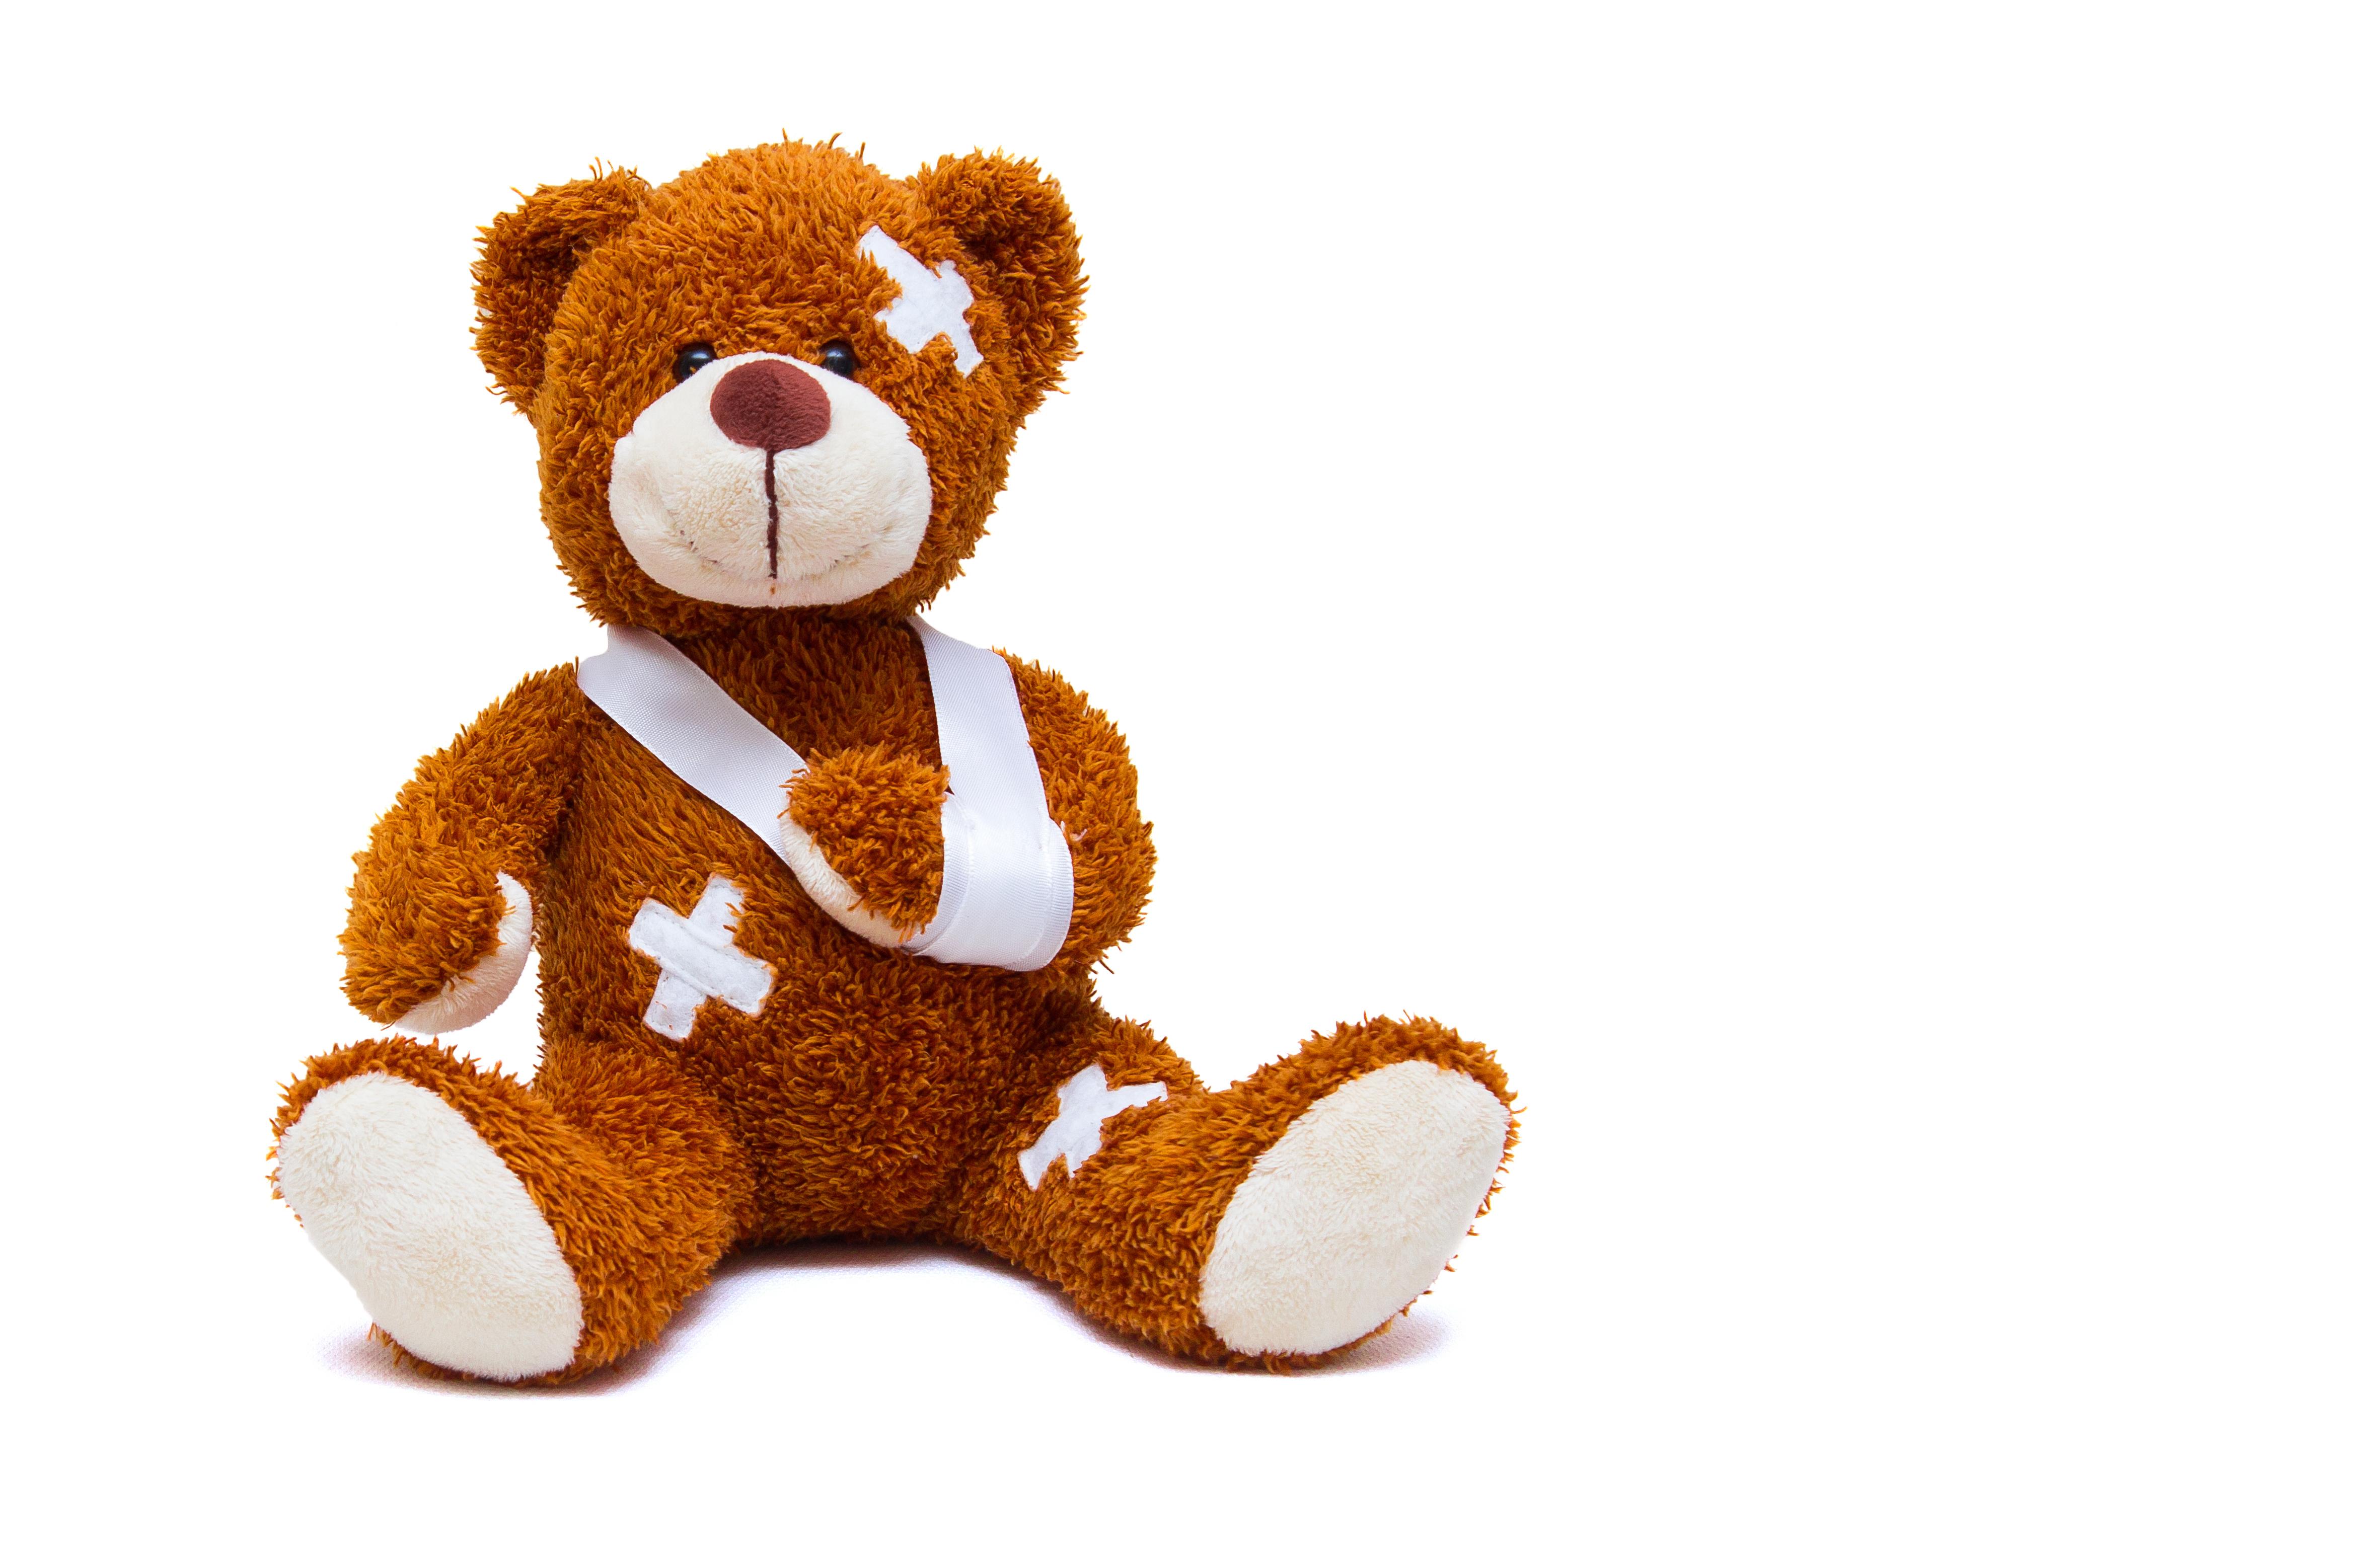 Injured (and bandaged up) teddy bear.